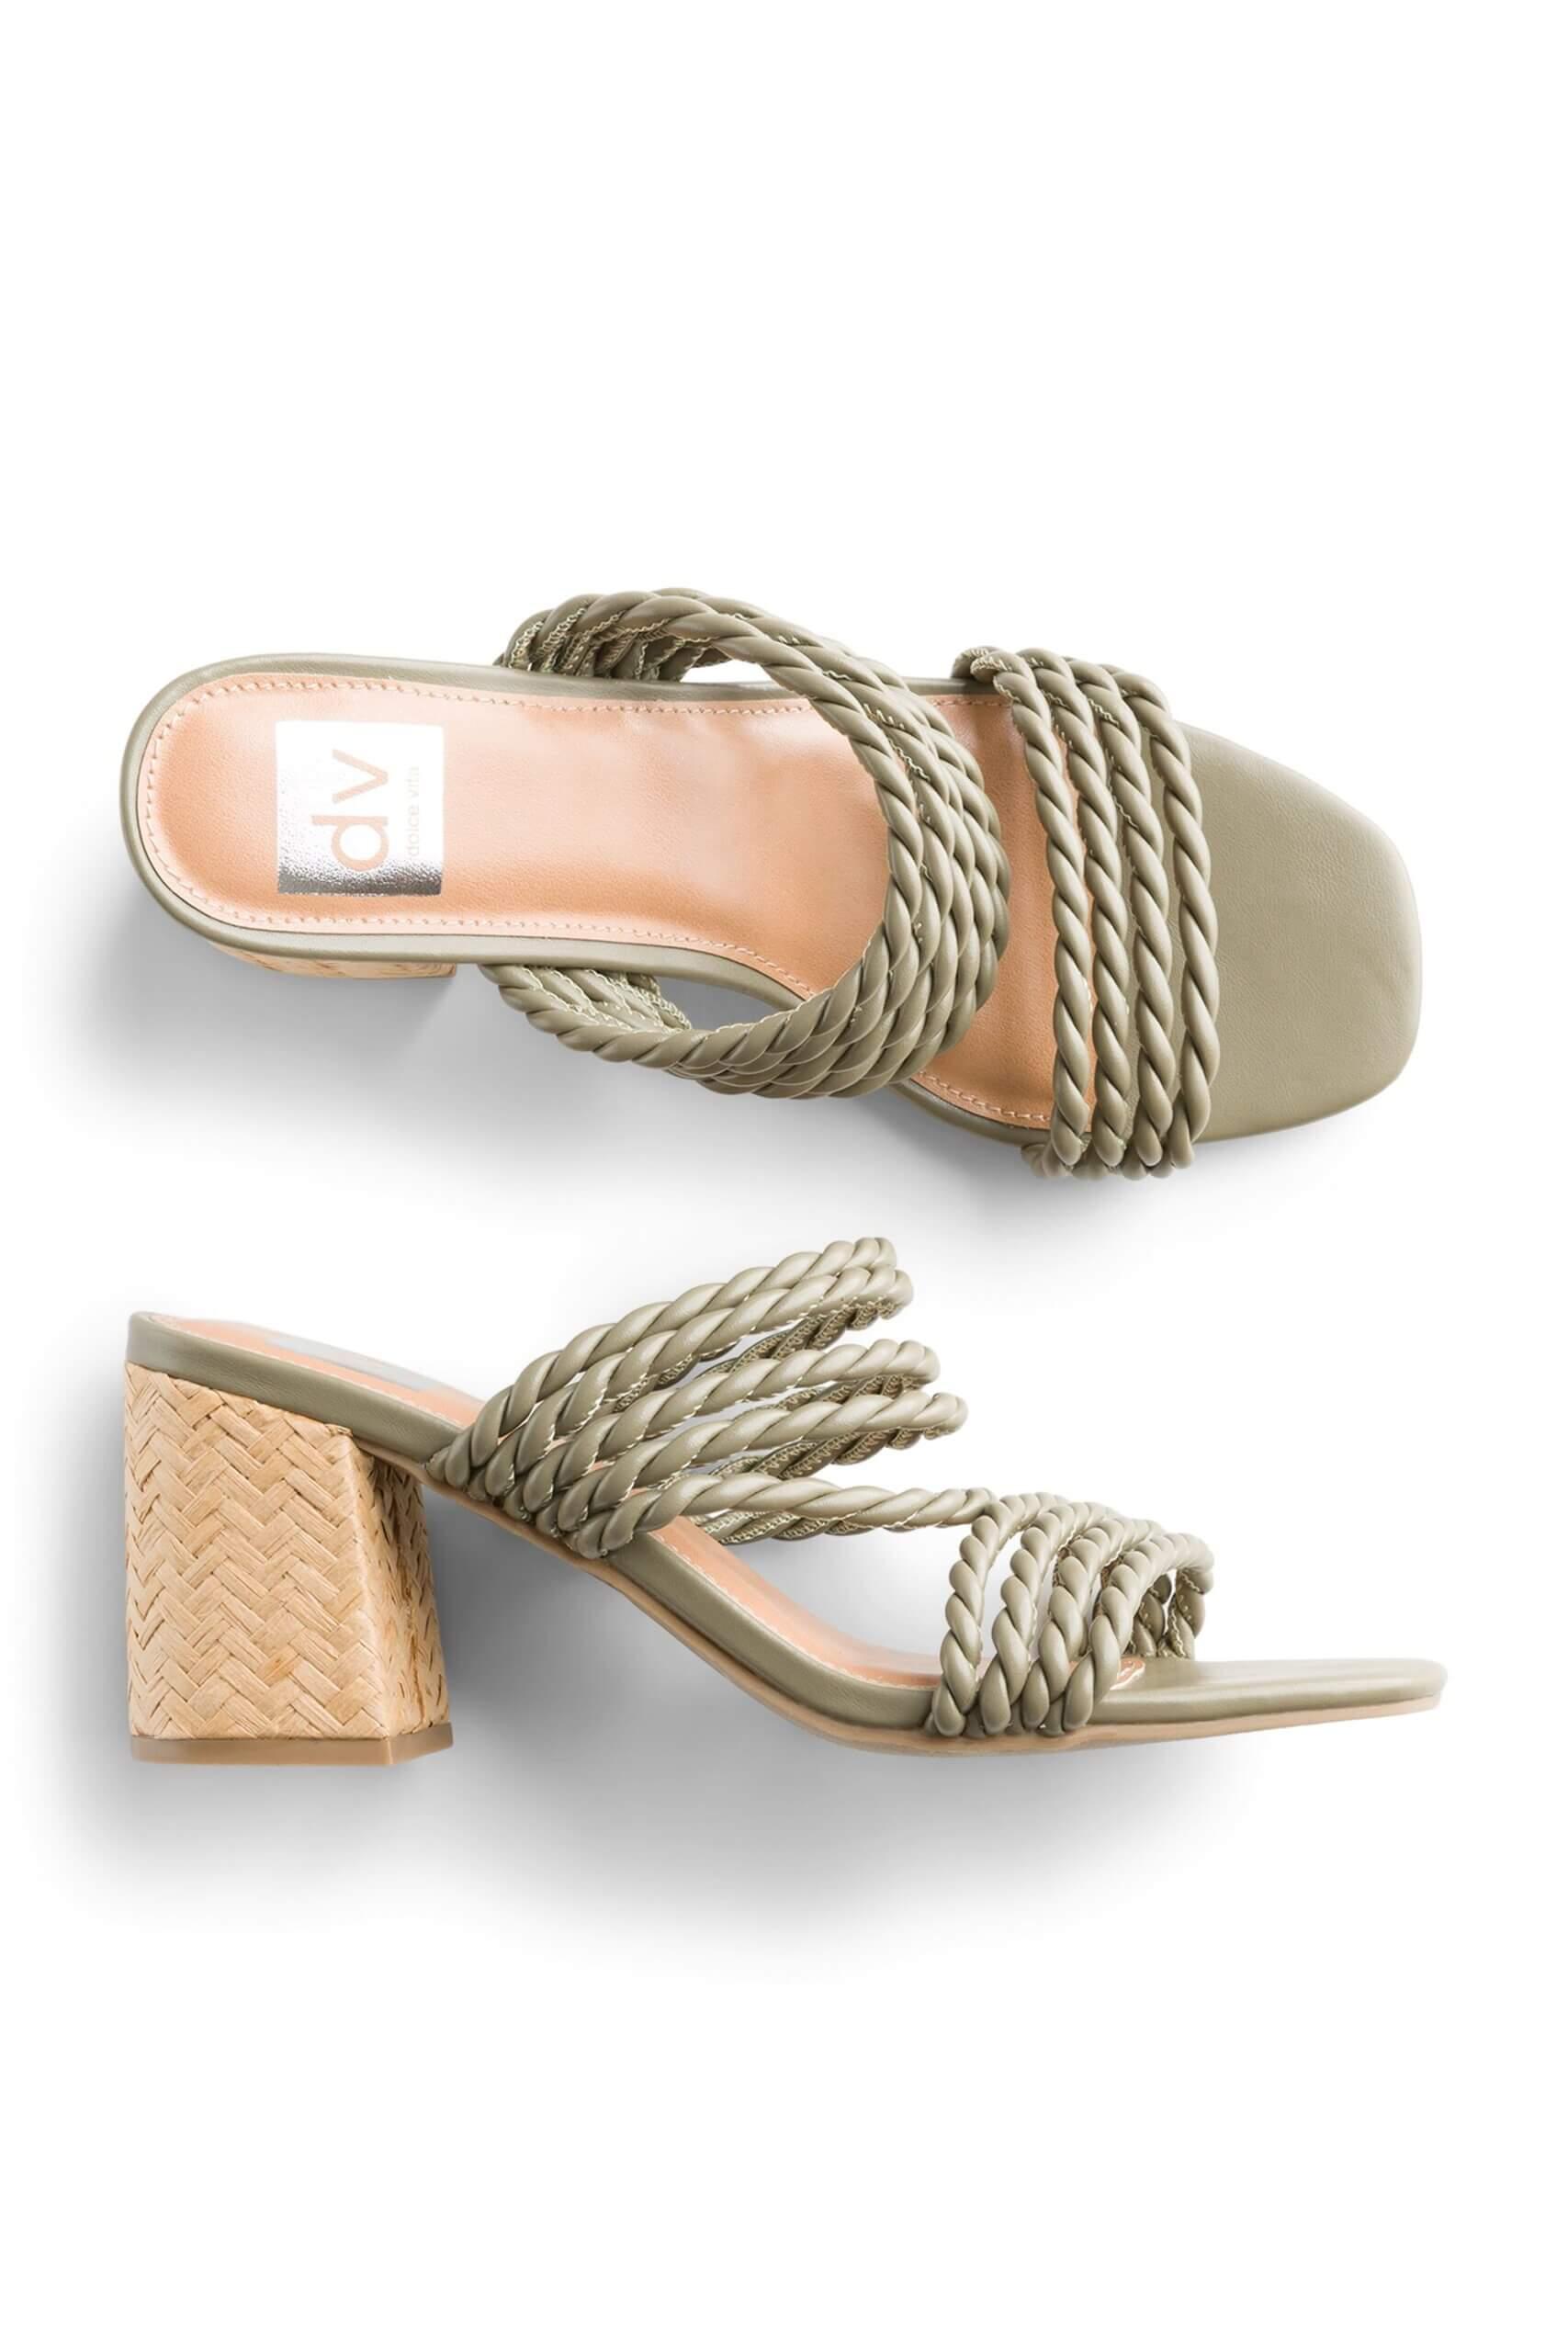 Stitch Fix women's olive green block heel sandals.